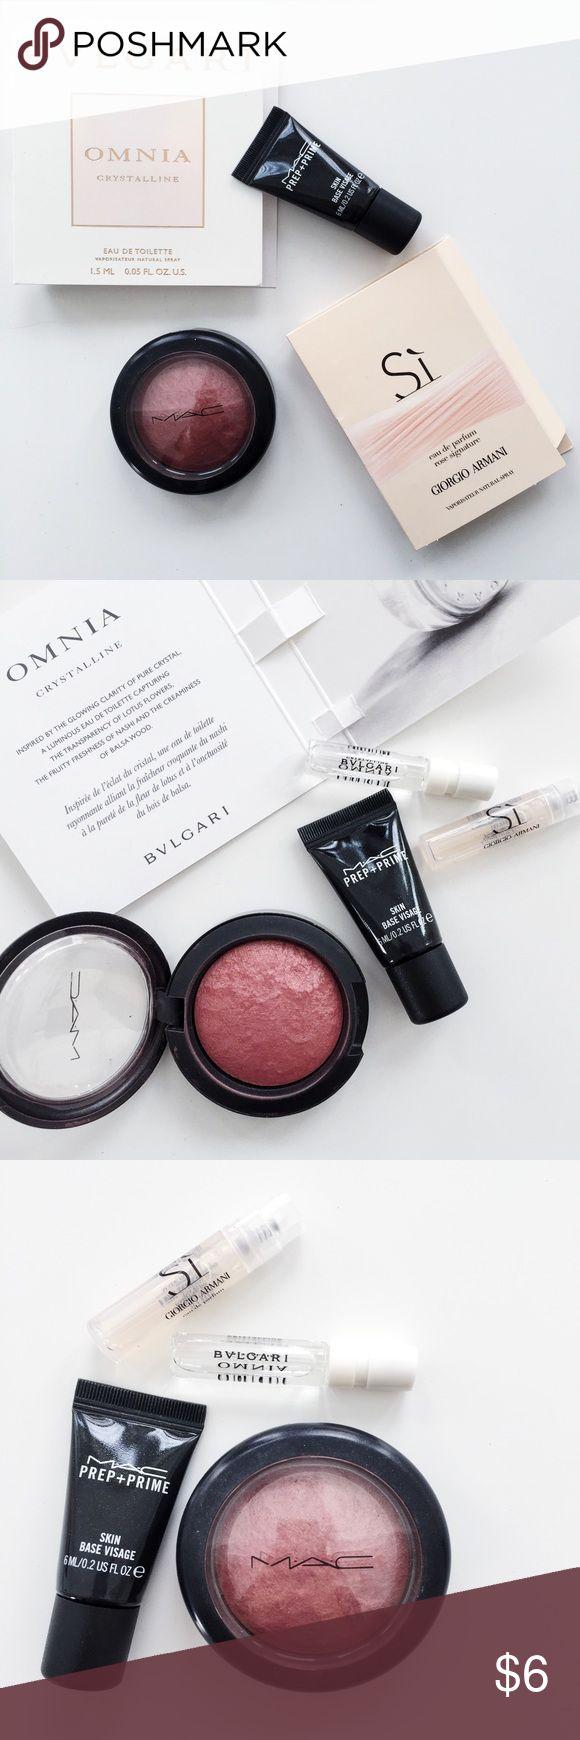 Beauty S&le Box & The 25+ best Makeup sample box ideas on Pinterest   Monthly makeup ... Aboutintivar.Com